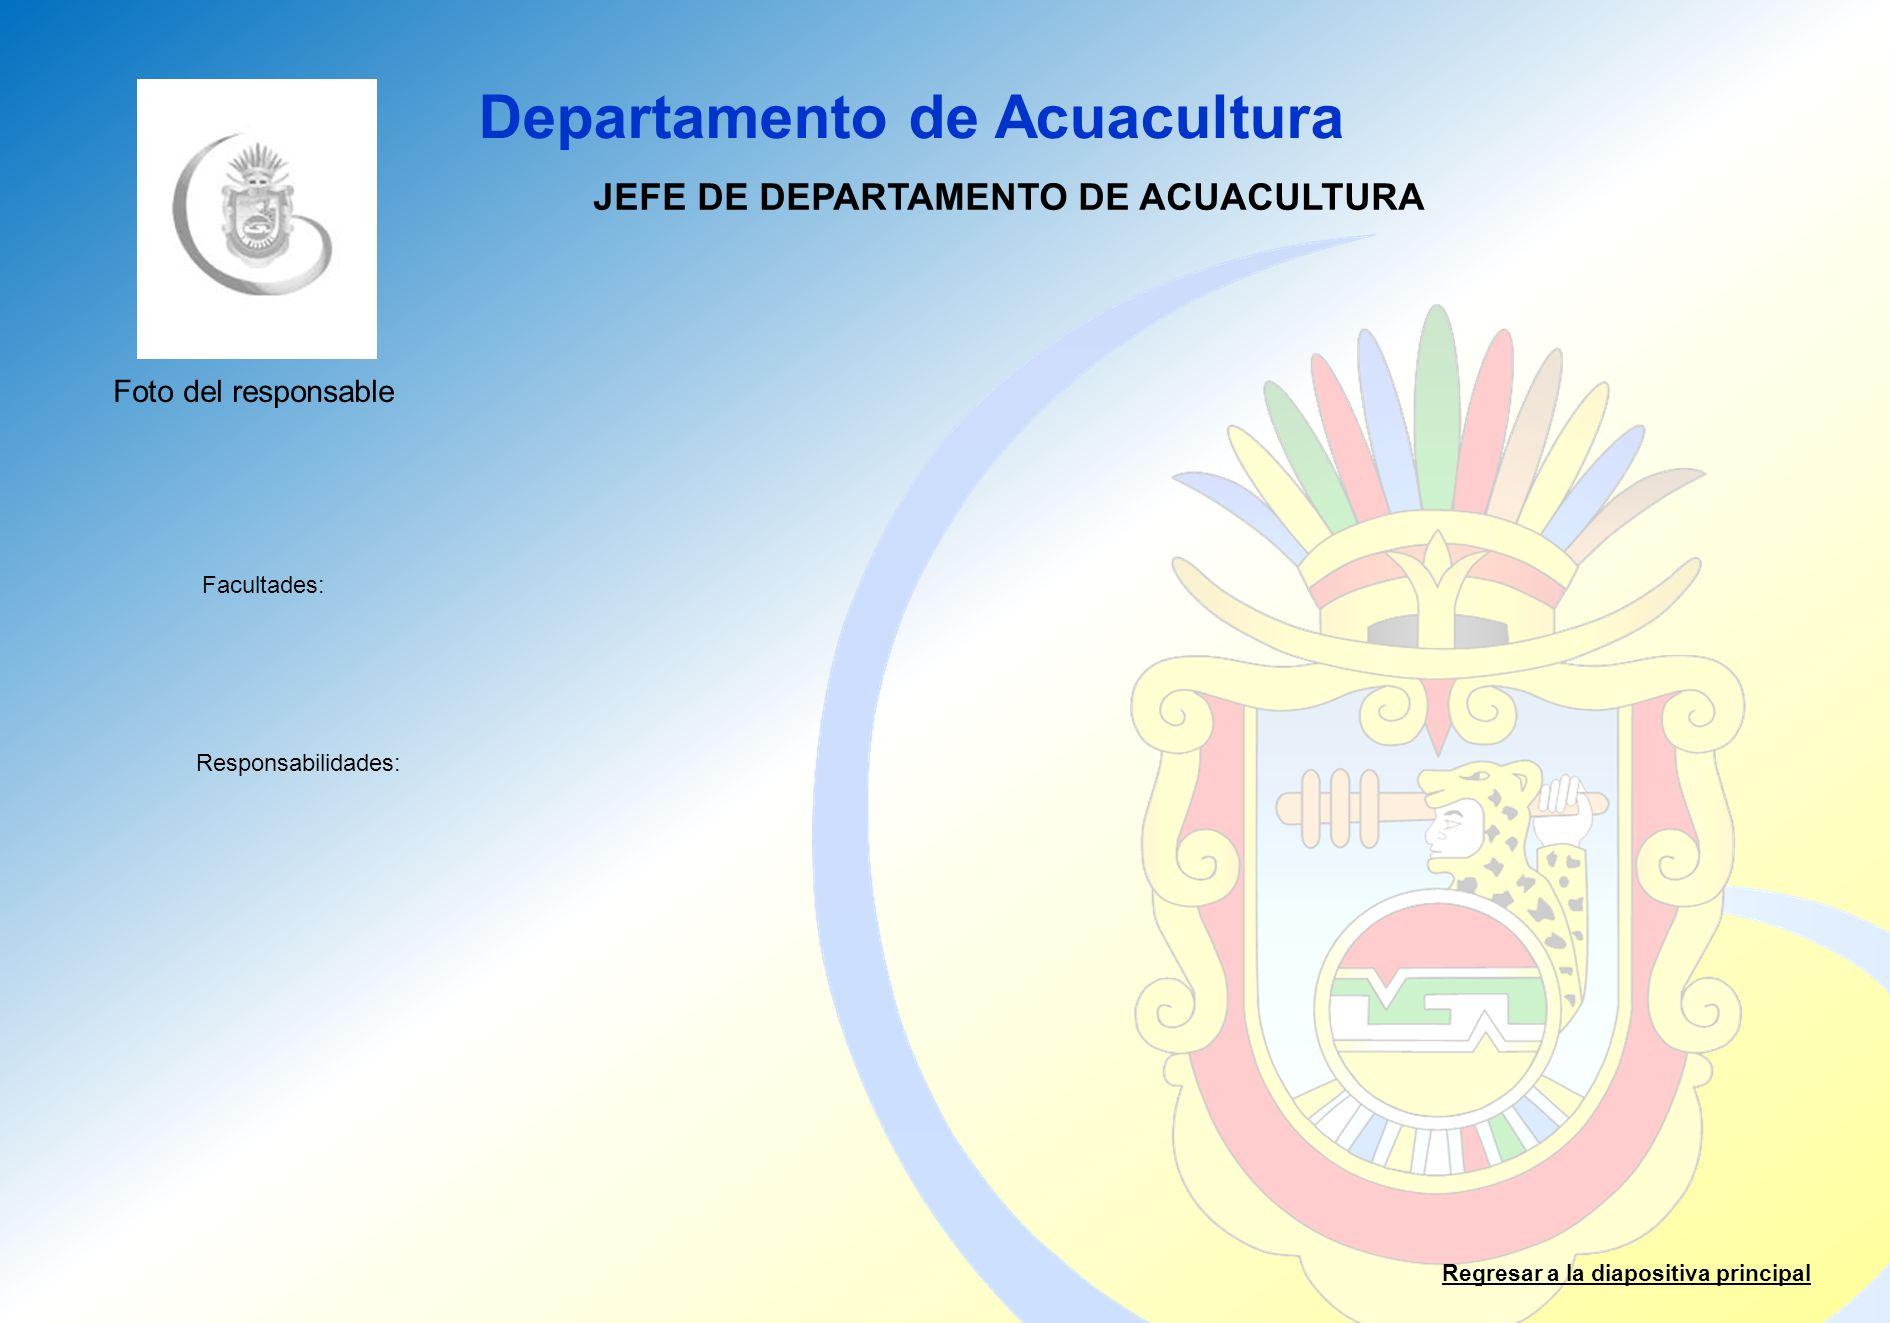 JEFE DE DEPARTAMENTO DE ACUACULTURA